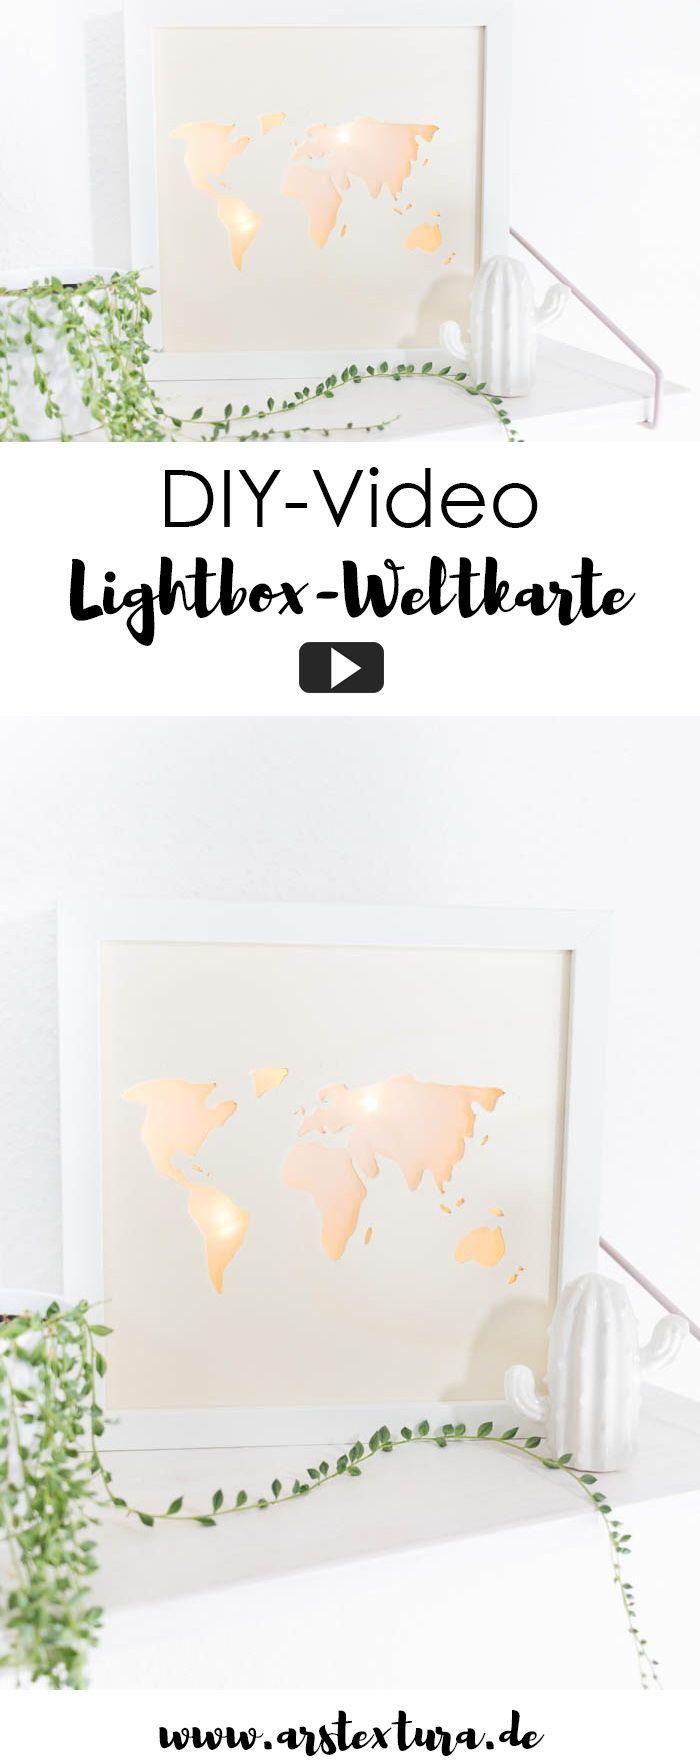 Beleuchtete Weltkarte - DIY Lightbox basteln